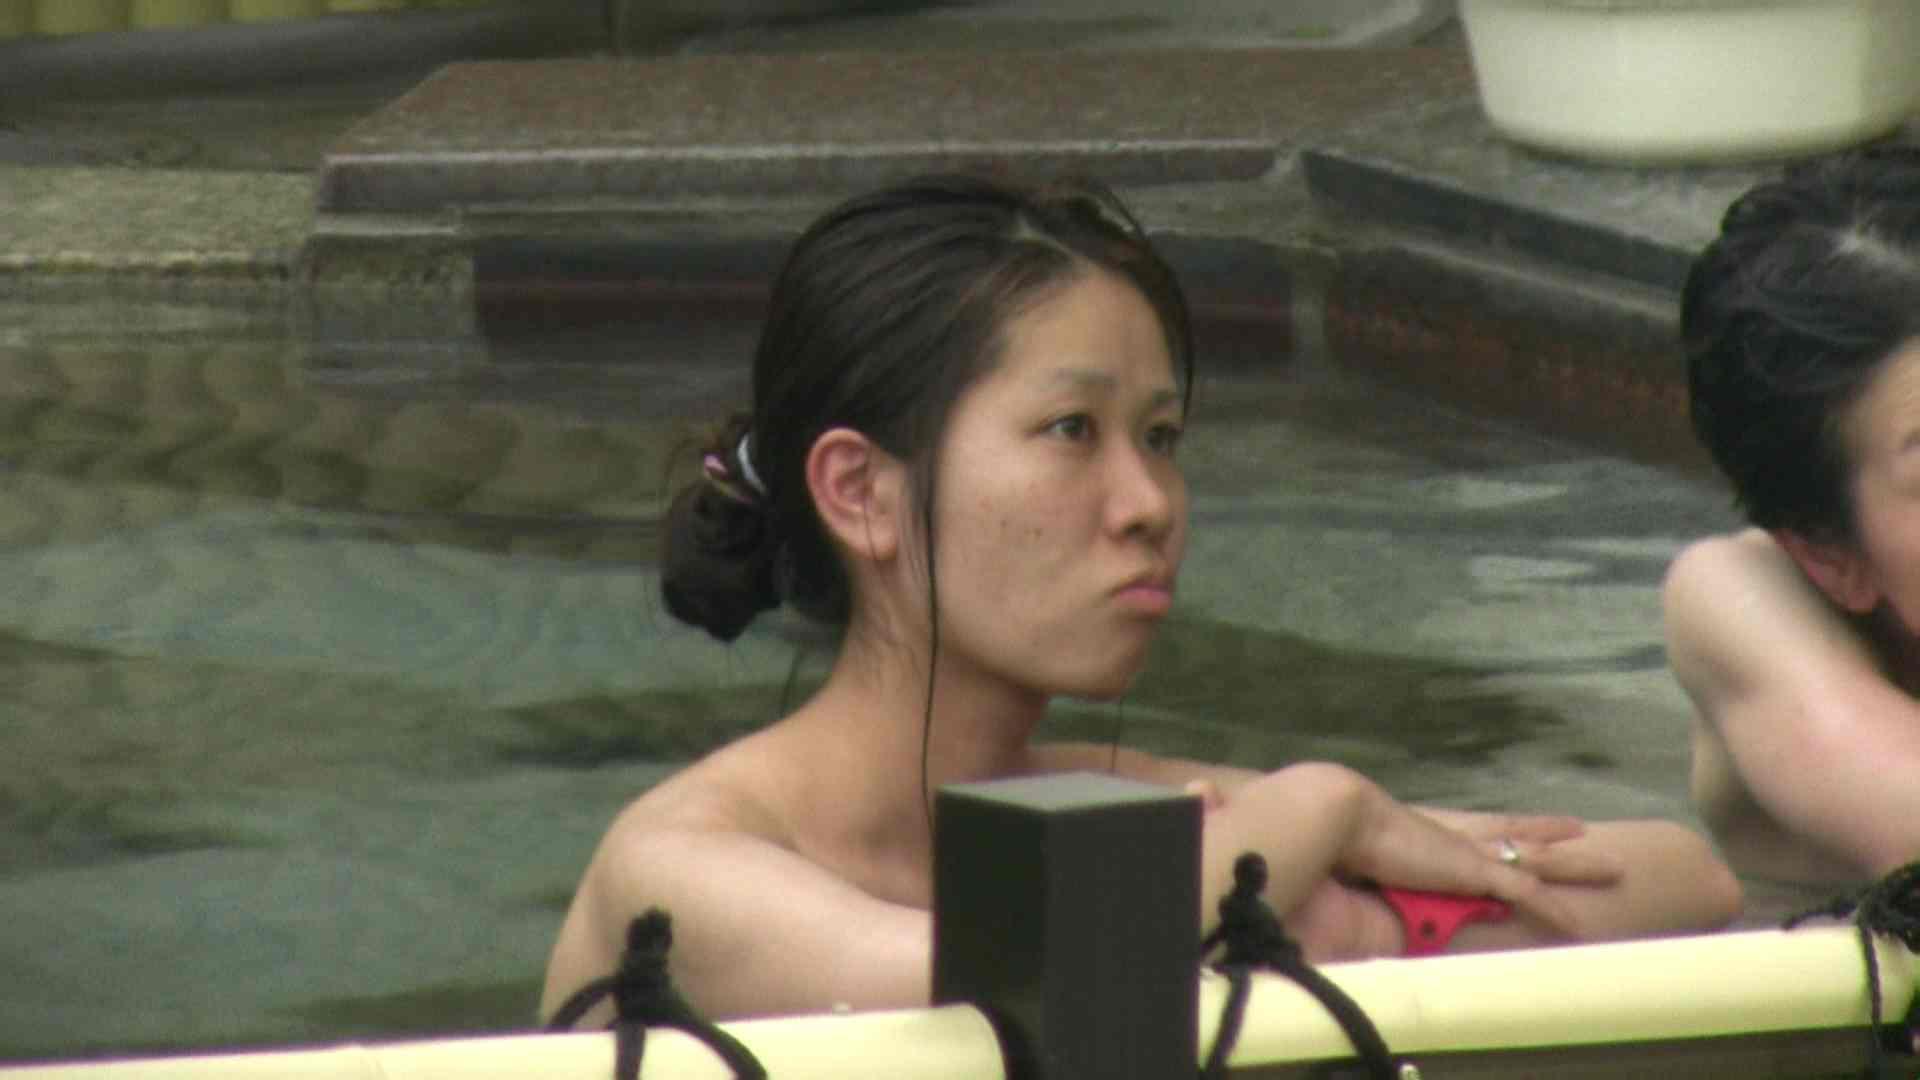 Aquaな露天風呂Vol.07 露天風呂 エロ無料画像 111連発 74